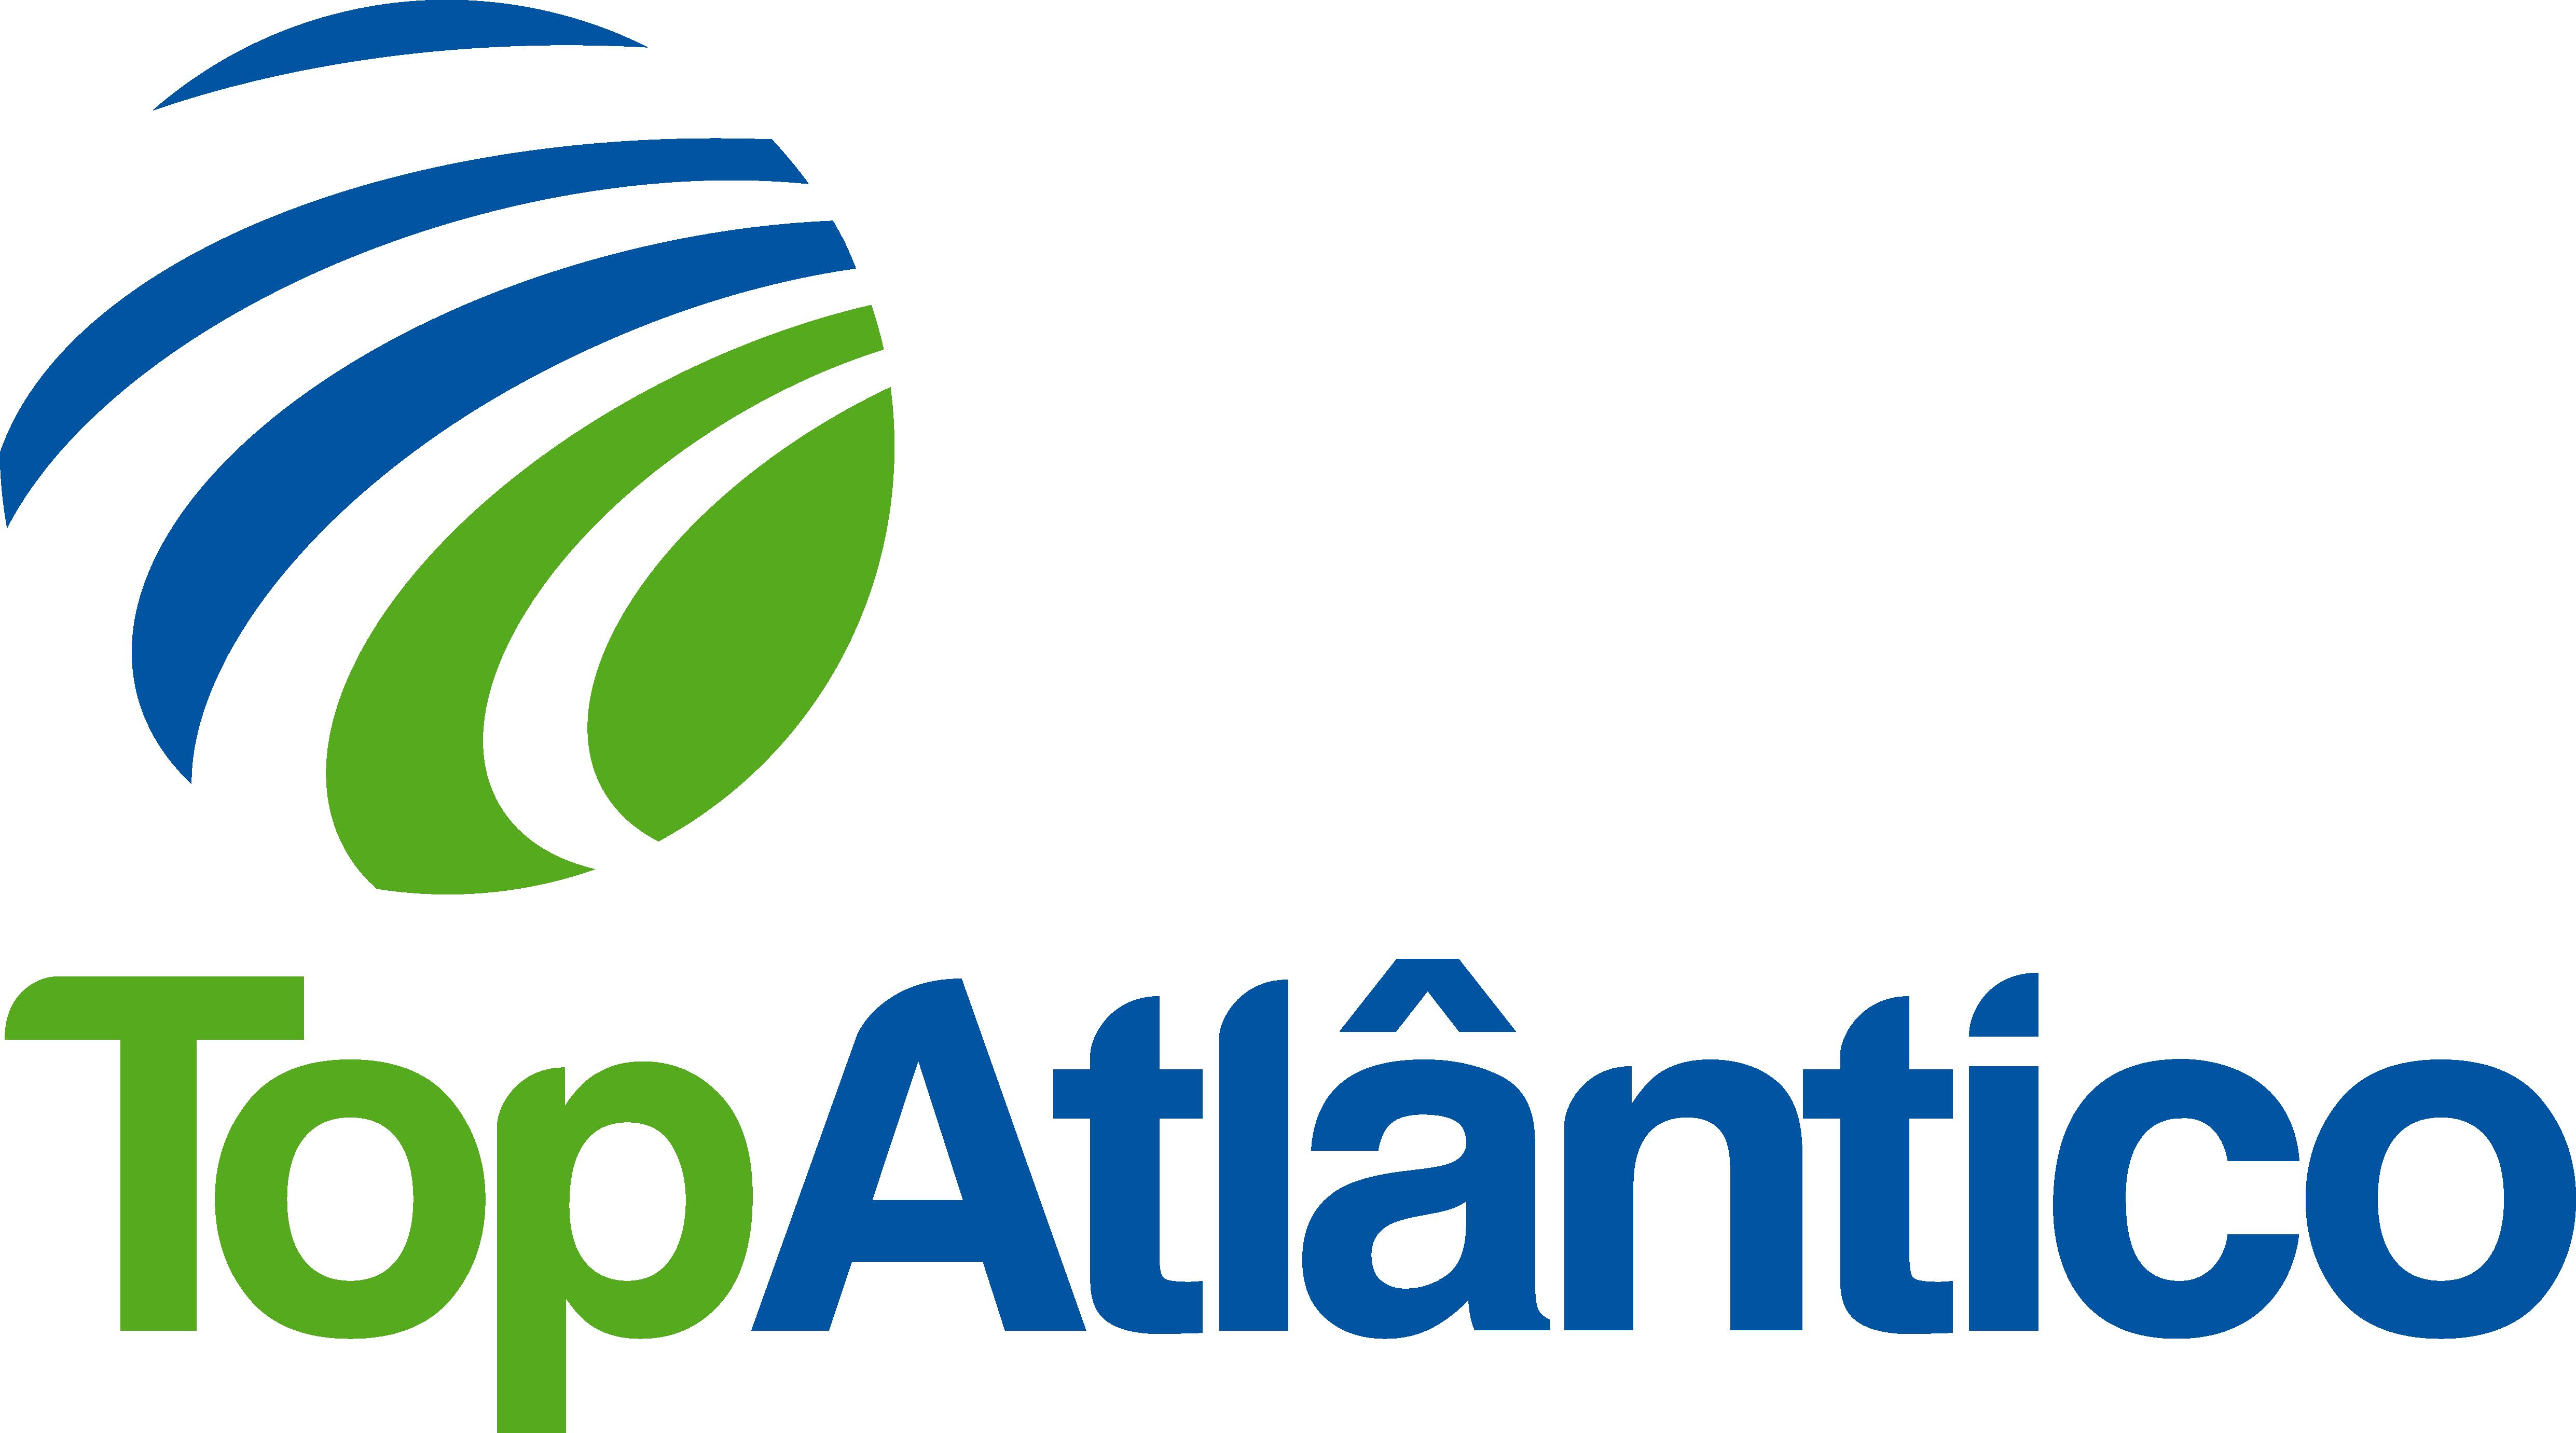 Logotipo Nicola